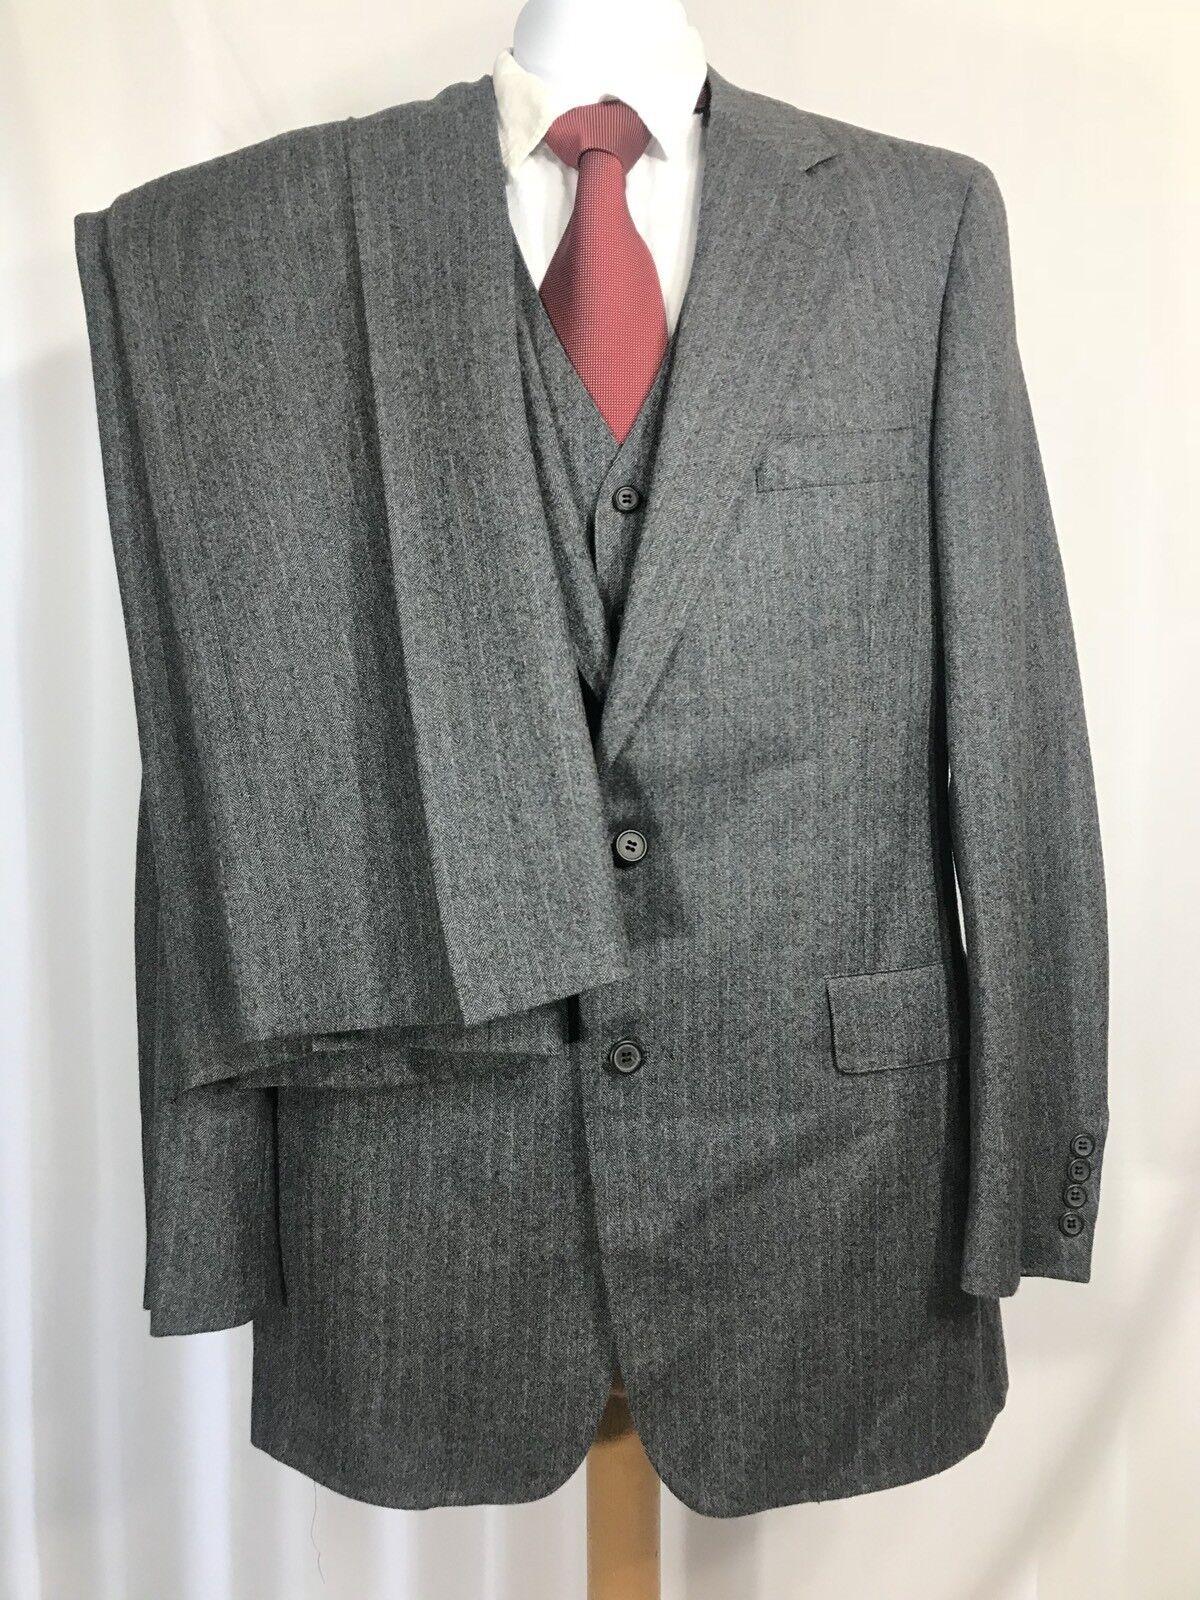 NORDSTROM Men grau Three Piece Suit Coat 42 Pant 34 X 36